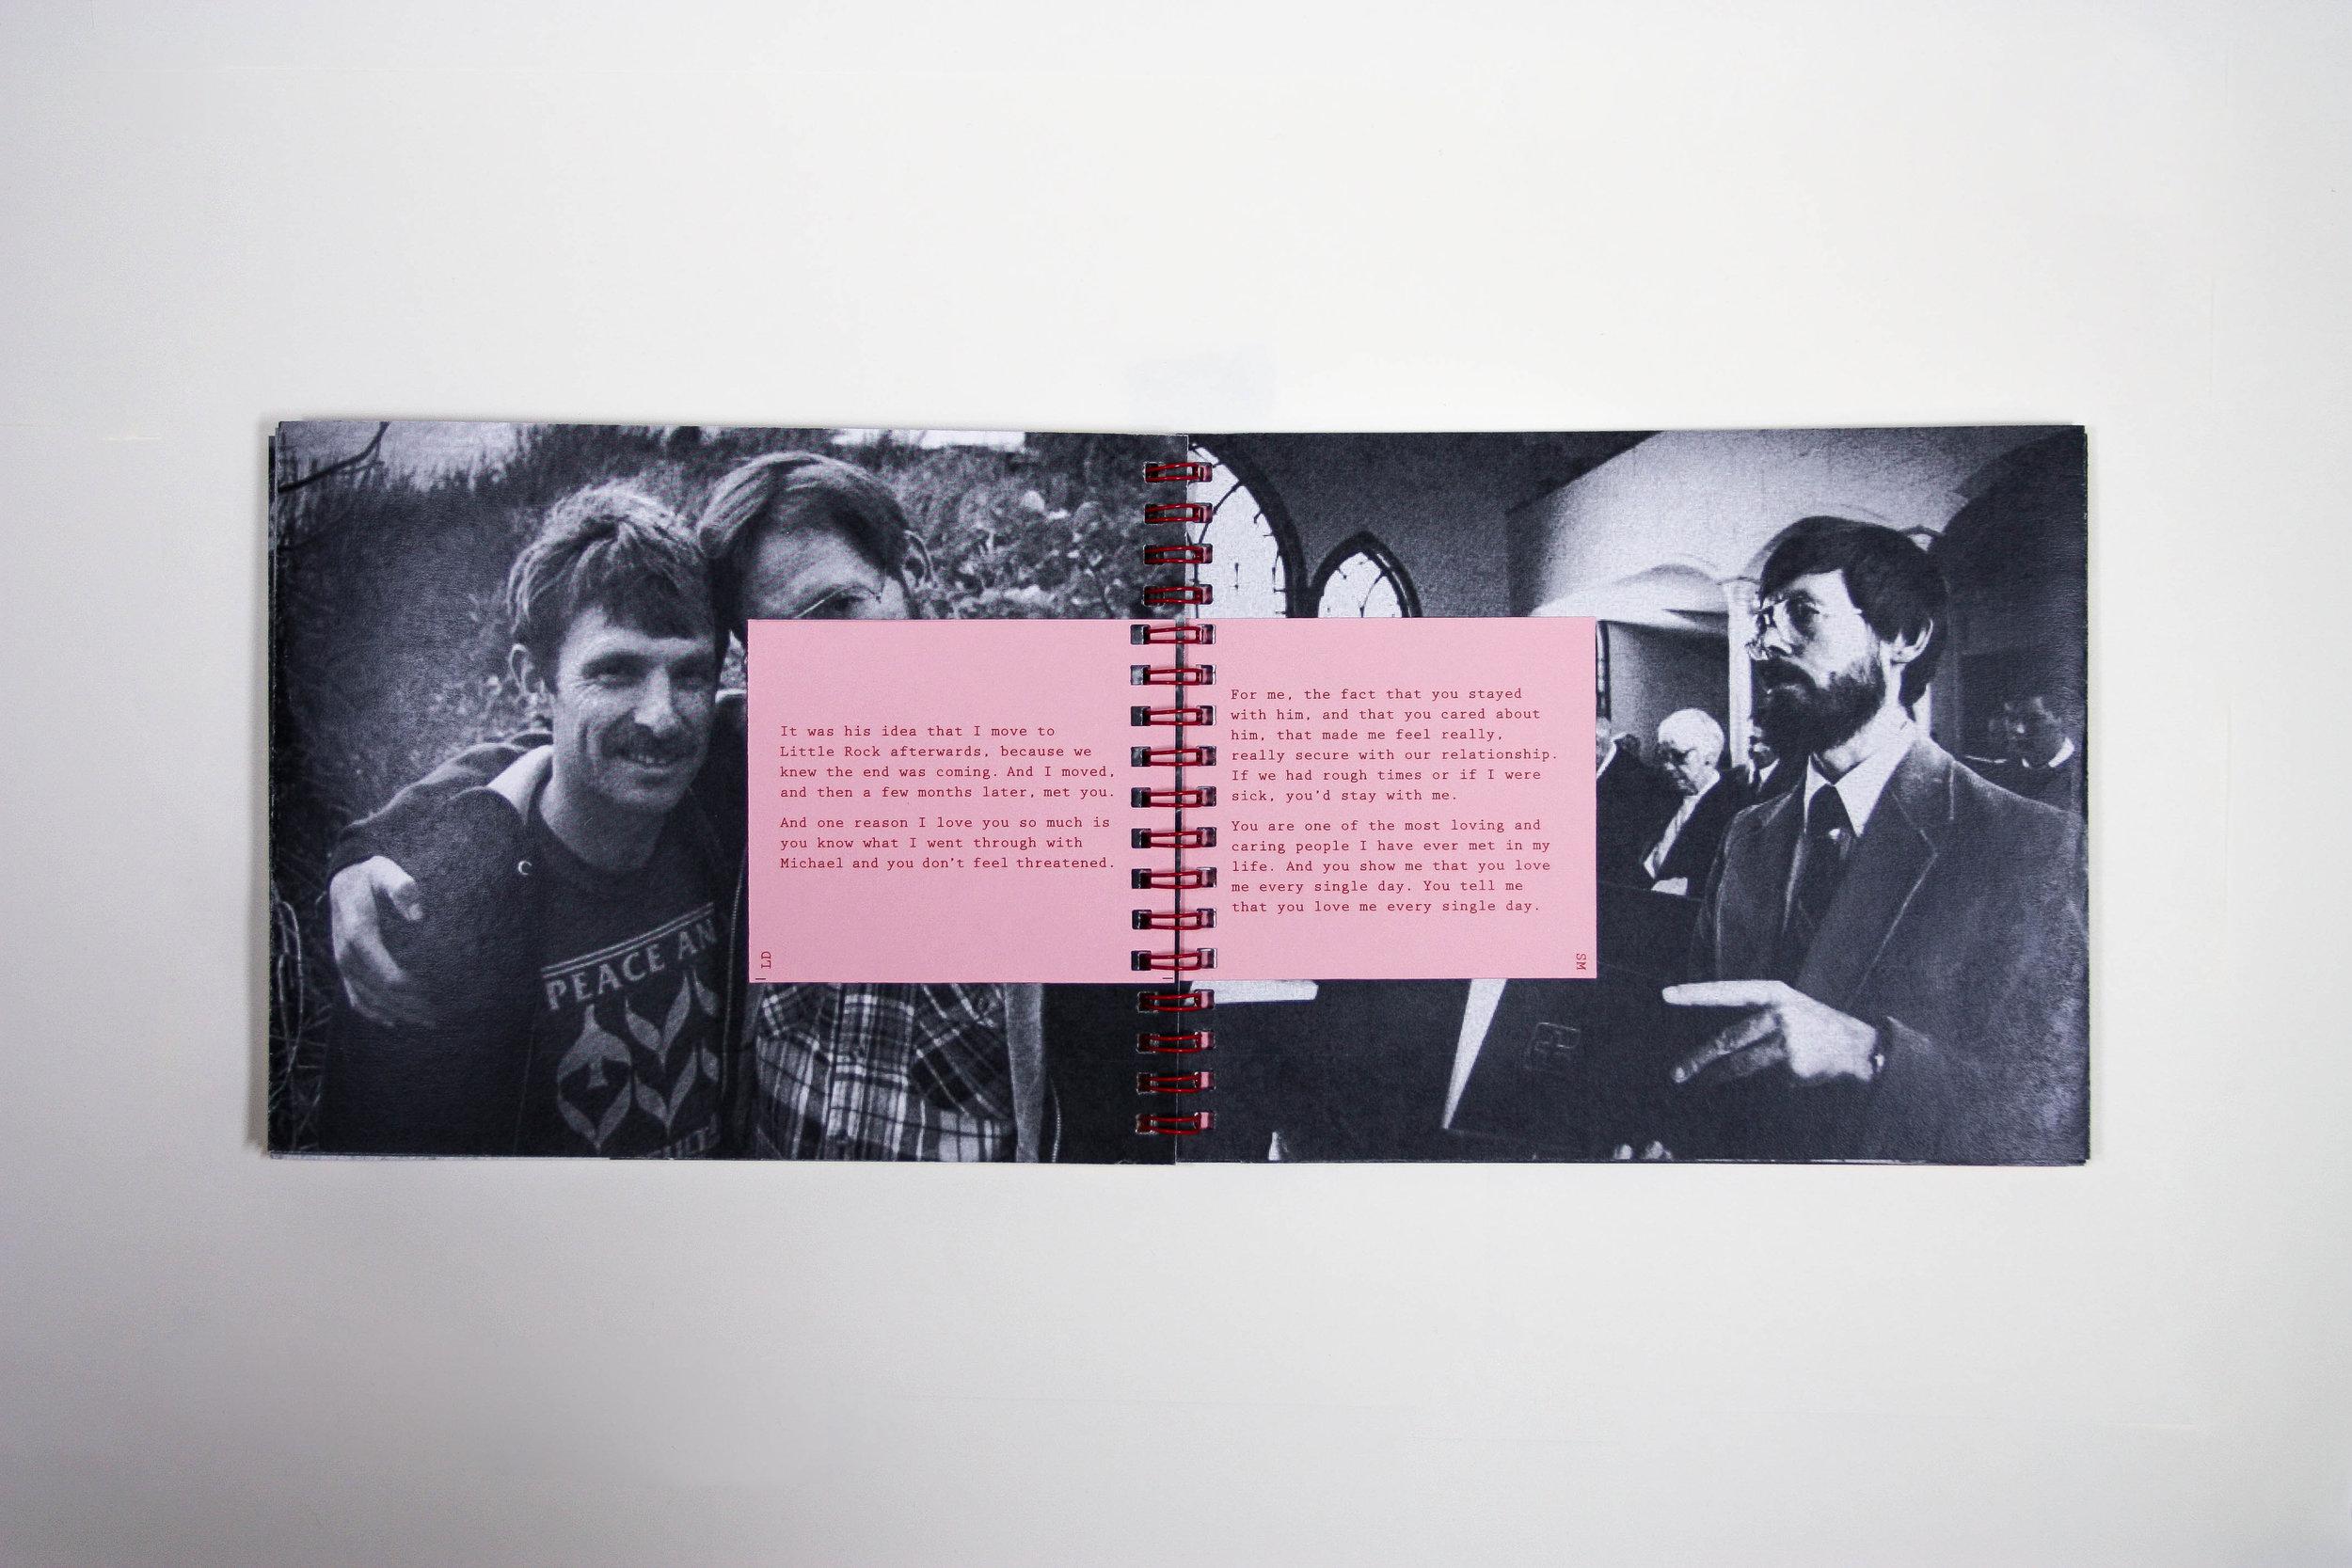 estory-bookimages-17.jpg